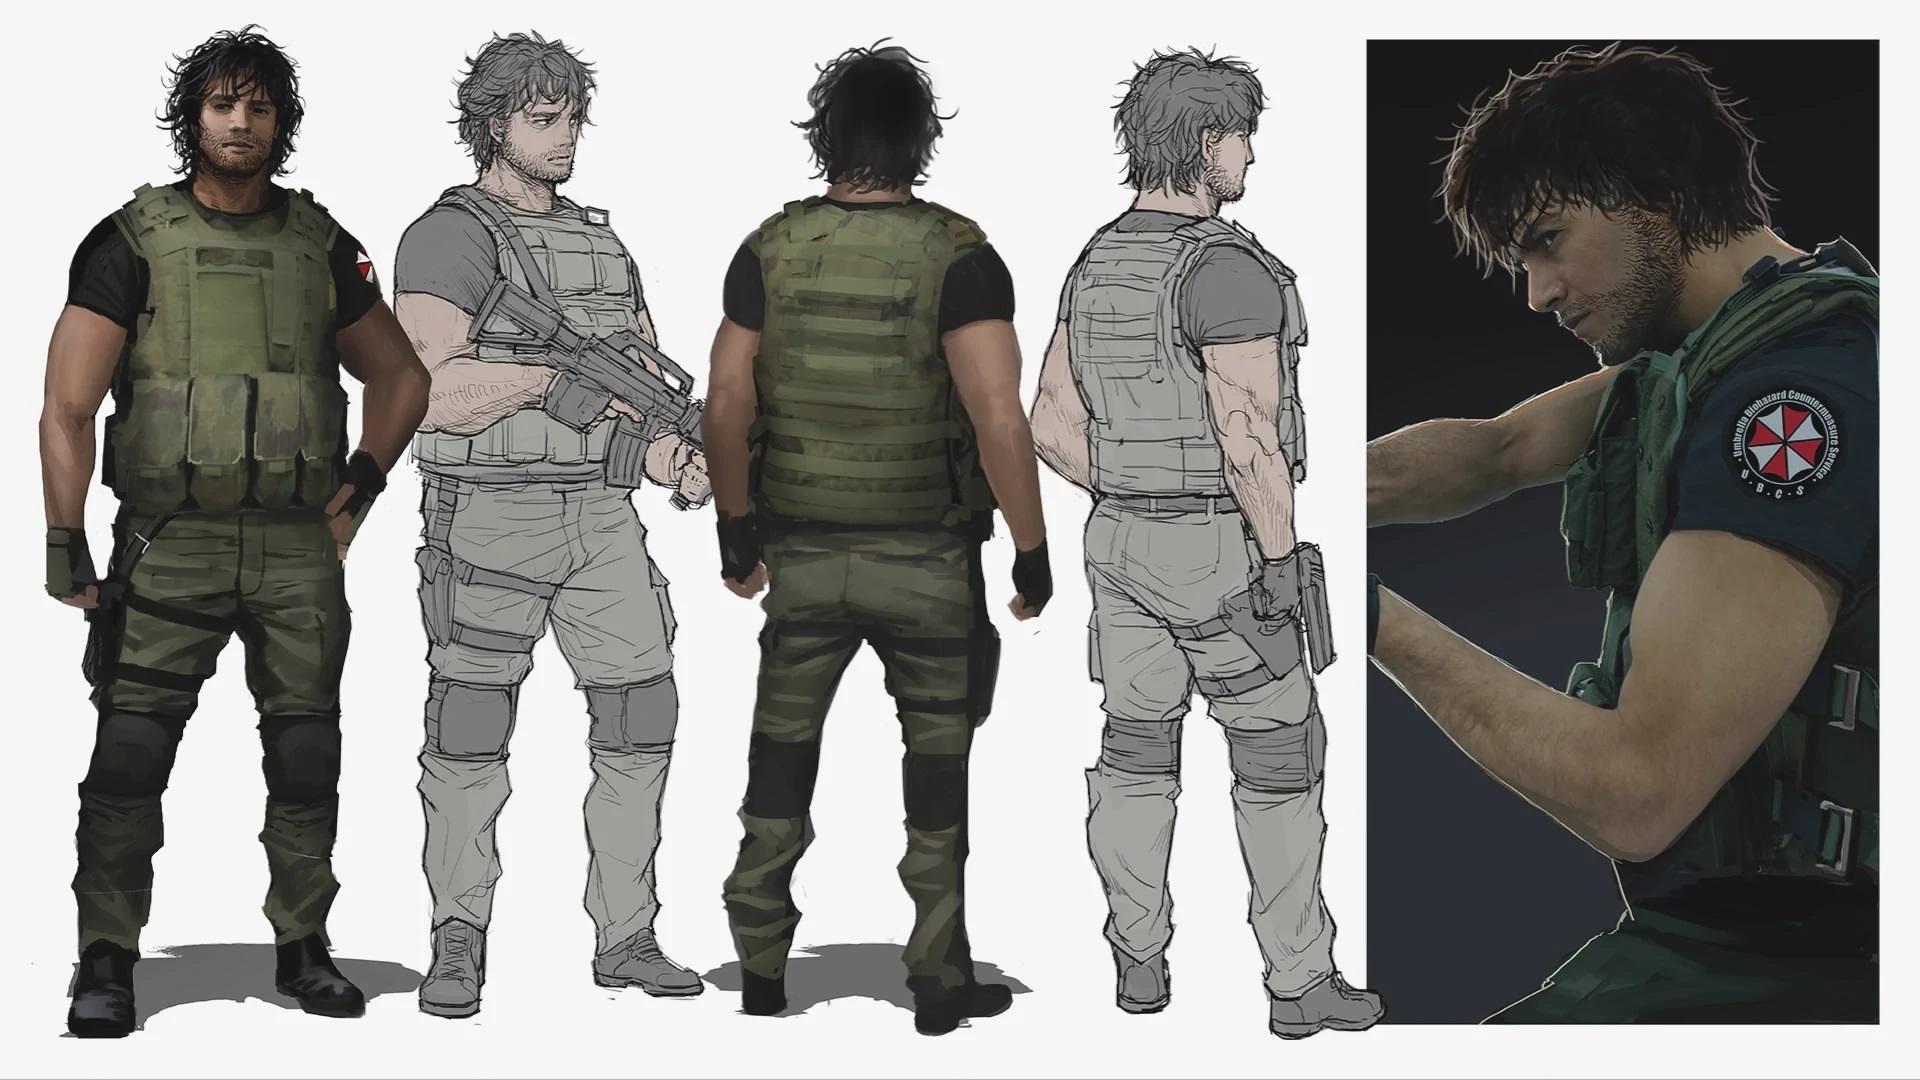 Концепт-арты Resident Evil 3 — как развивался дизайн ремейка